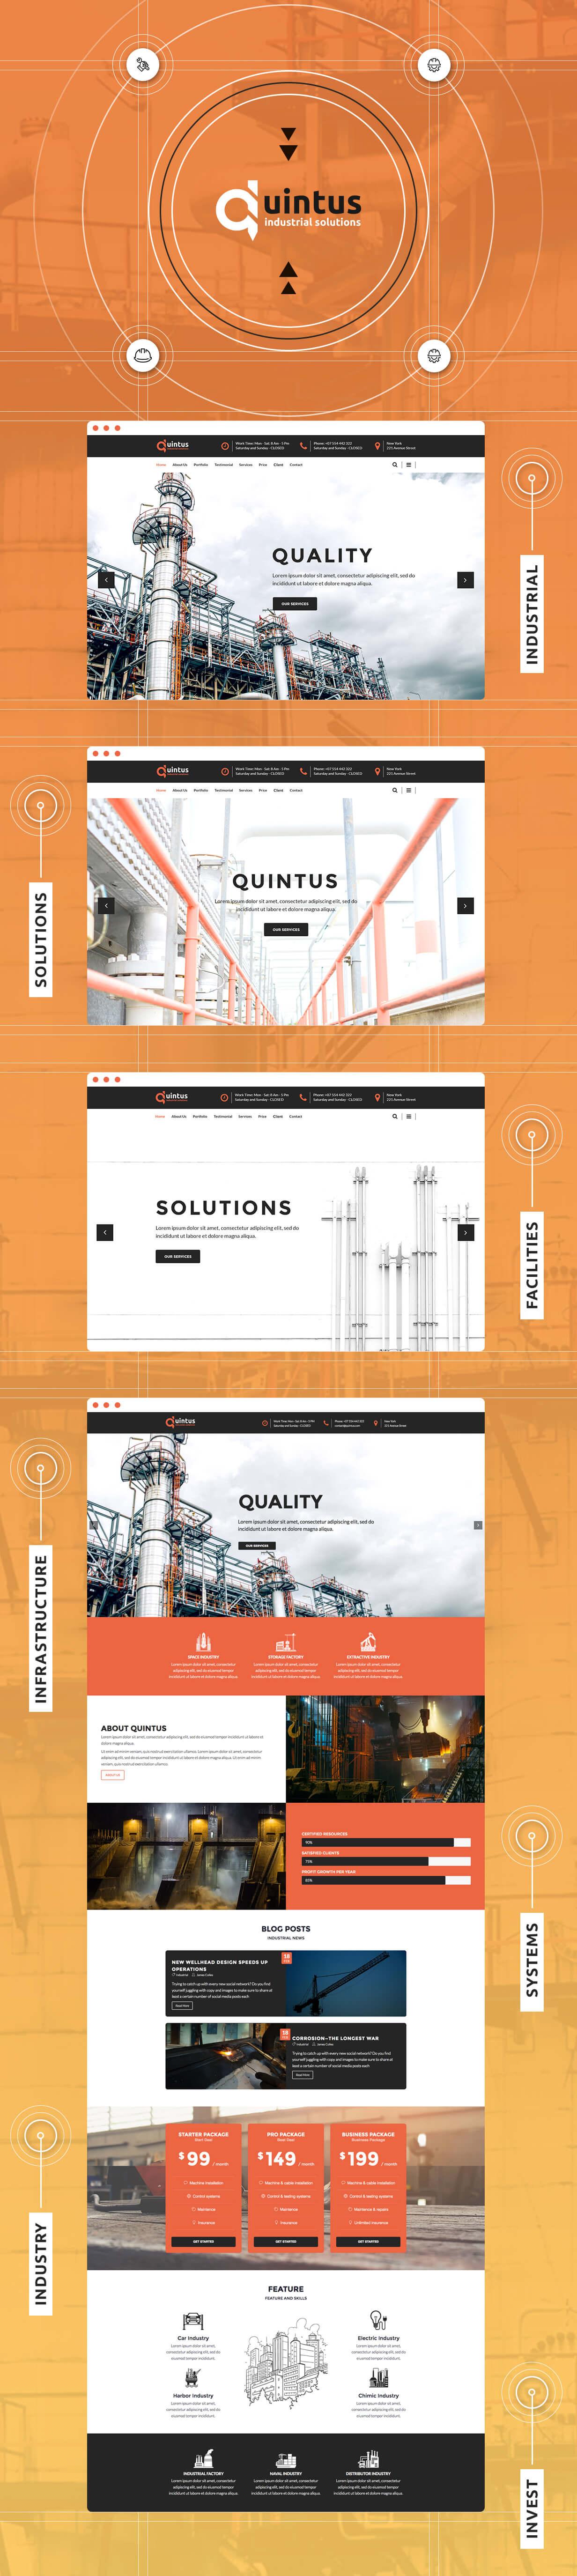 Quintus - Industrial & Engineering WordPress Theme - 2